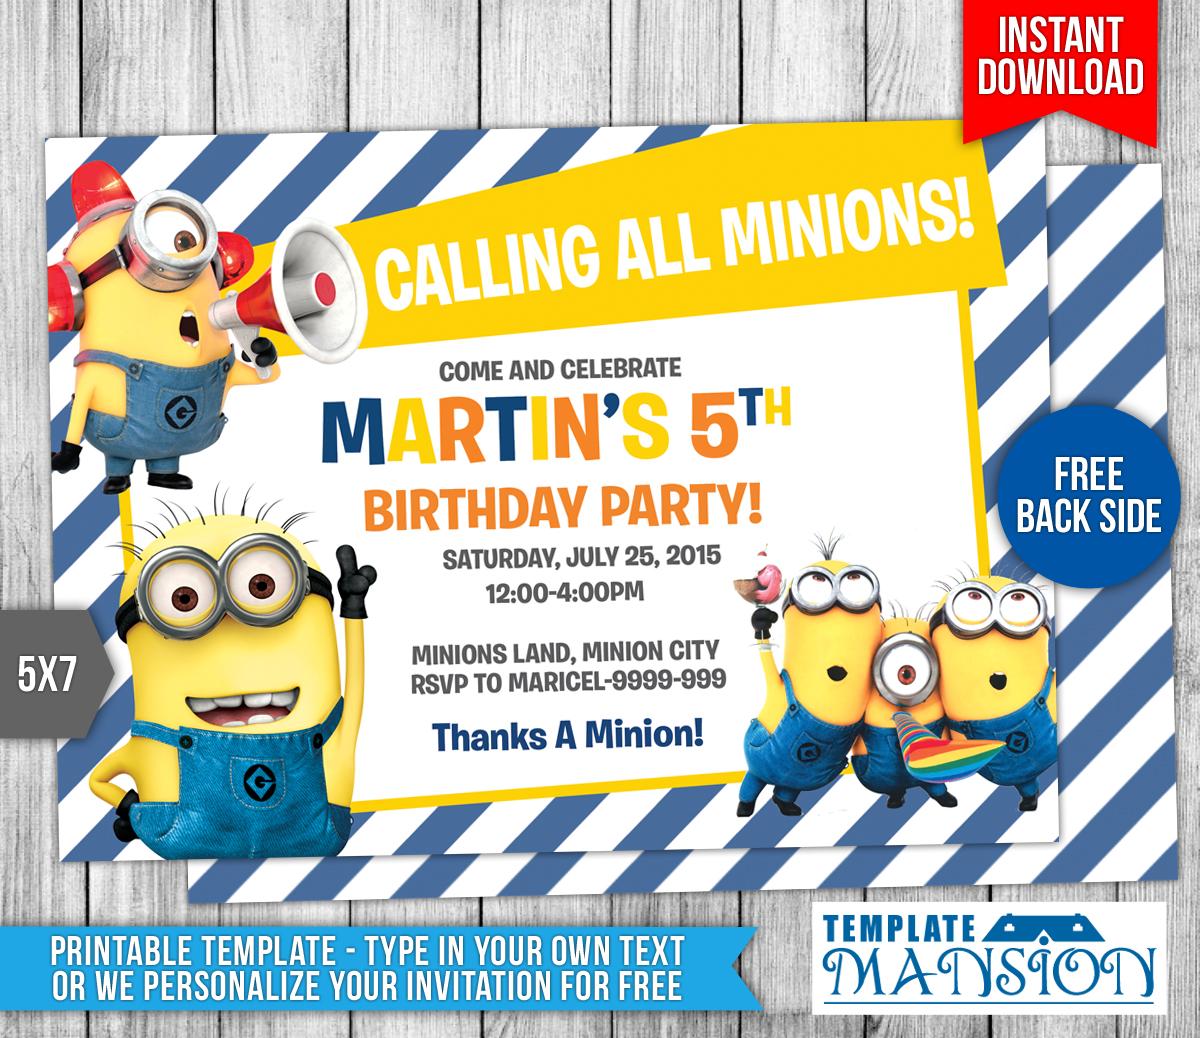 Minions Birthday Invitation 7 by templatemansion on DeviantArt